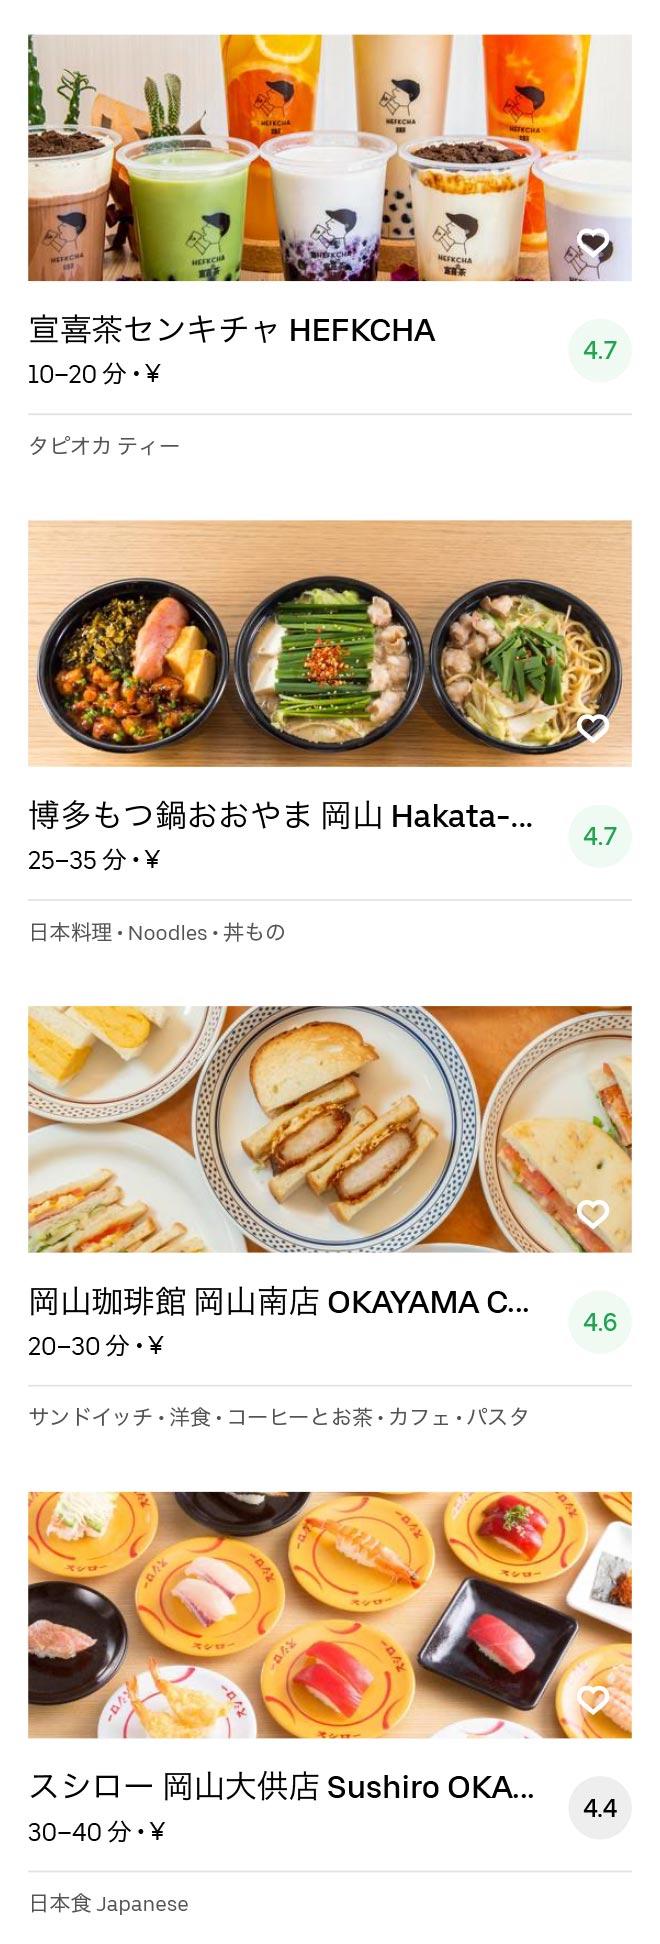 Okayama menu 2007 08